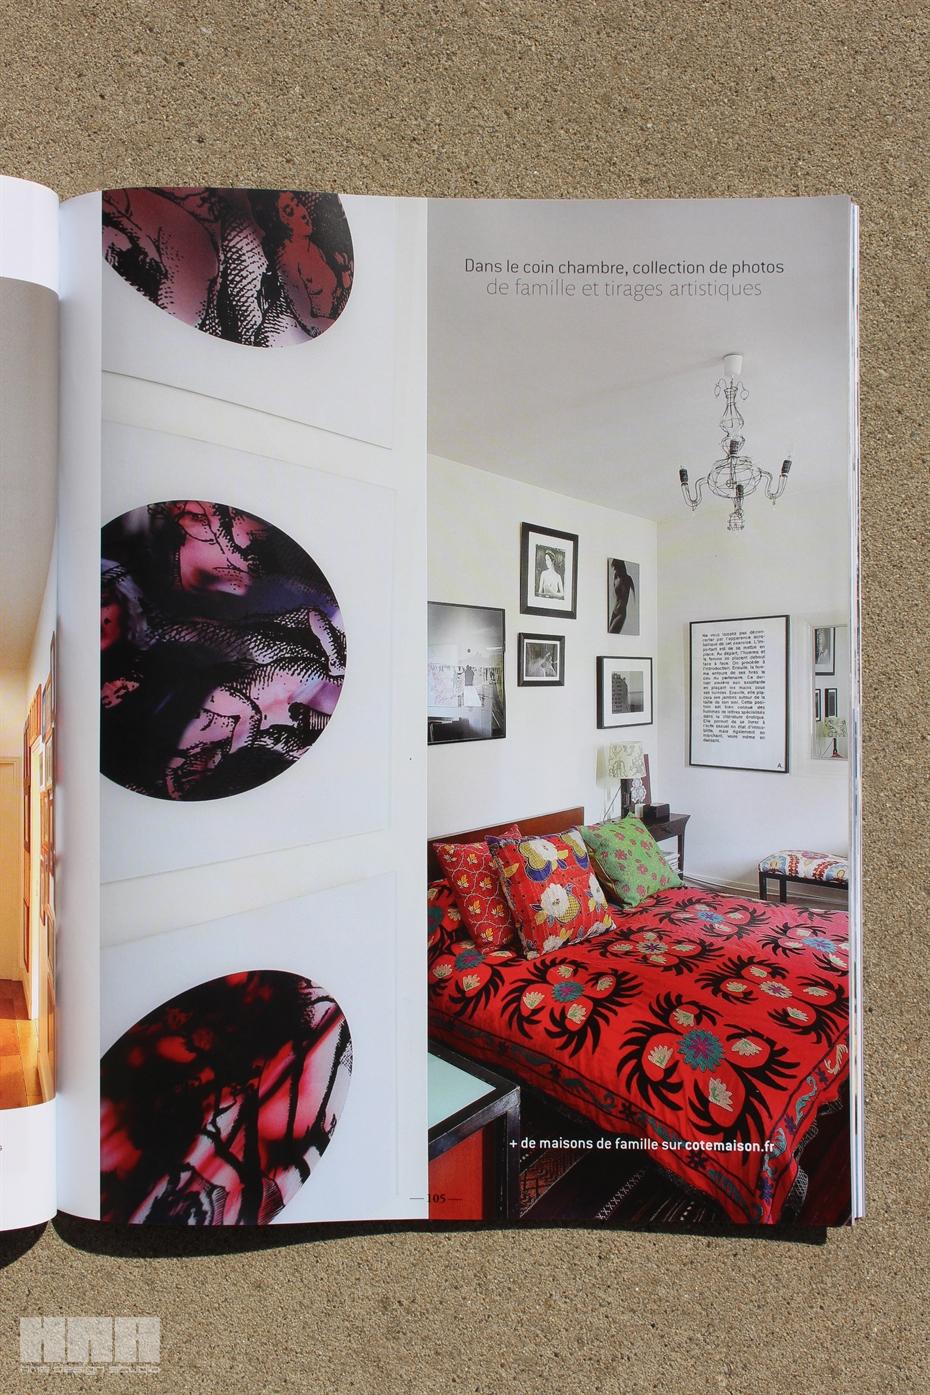 hna design inspiralo magazinok paris 19